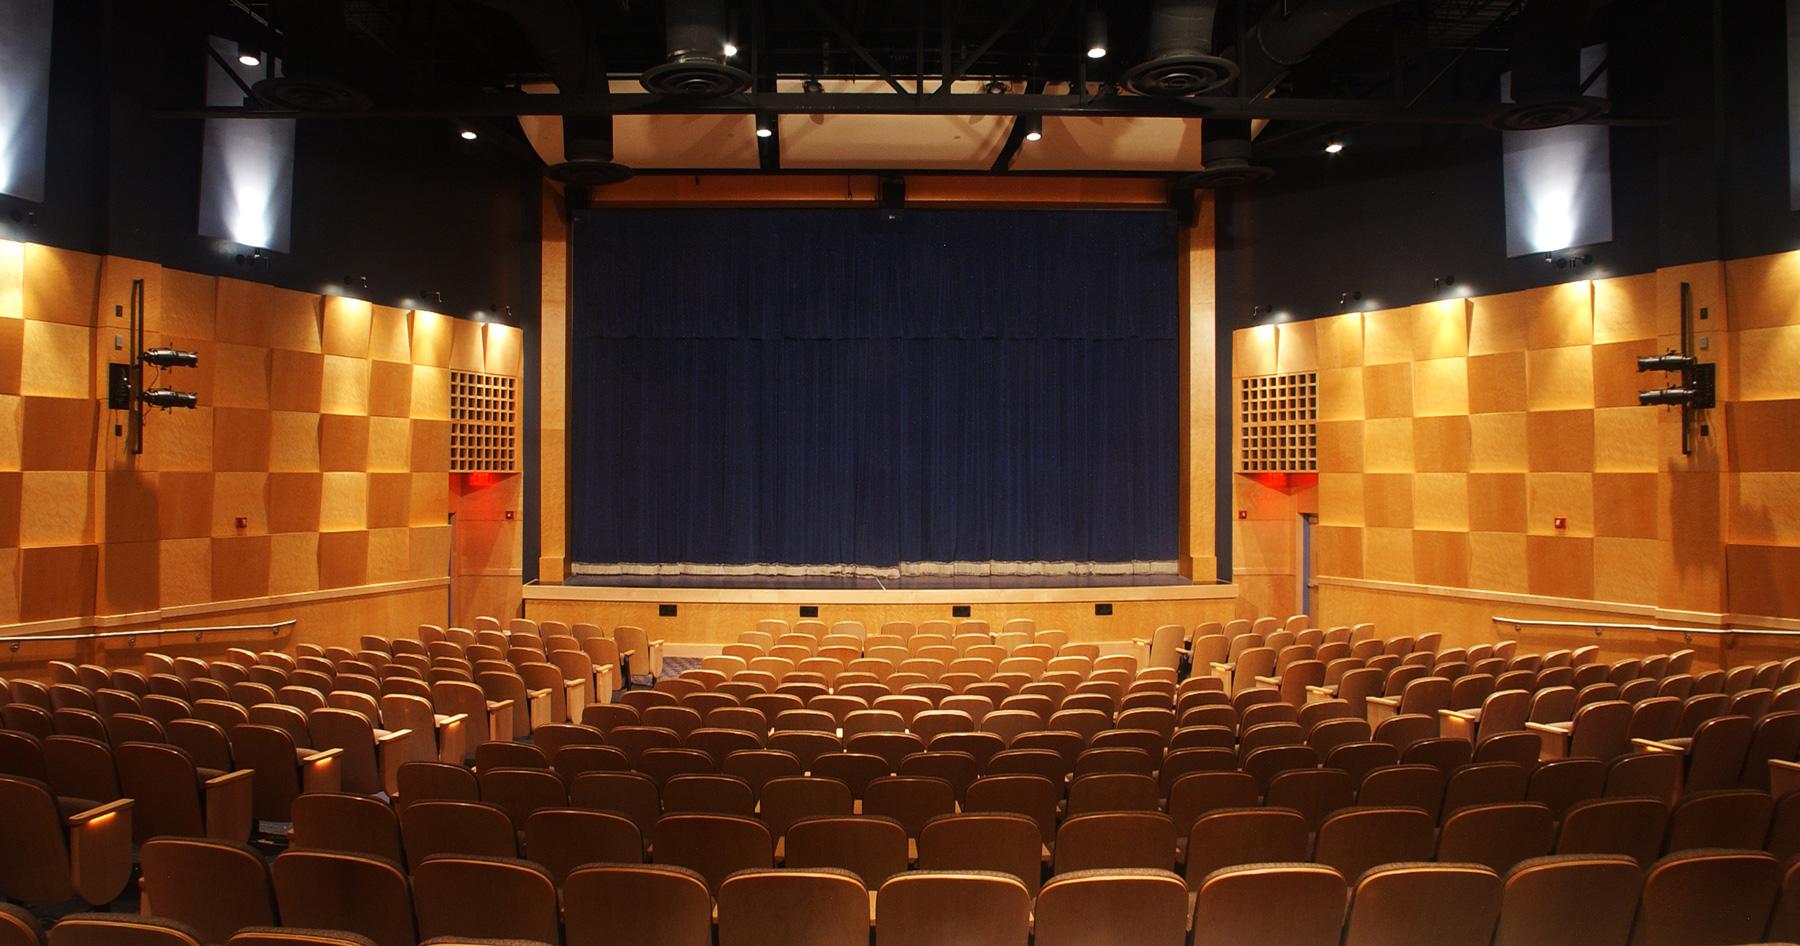 Sanply-maple-be-fla-memorial-college-auditorium_8009900368_o